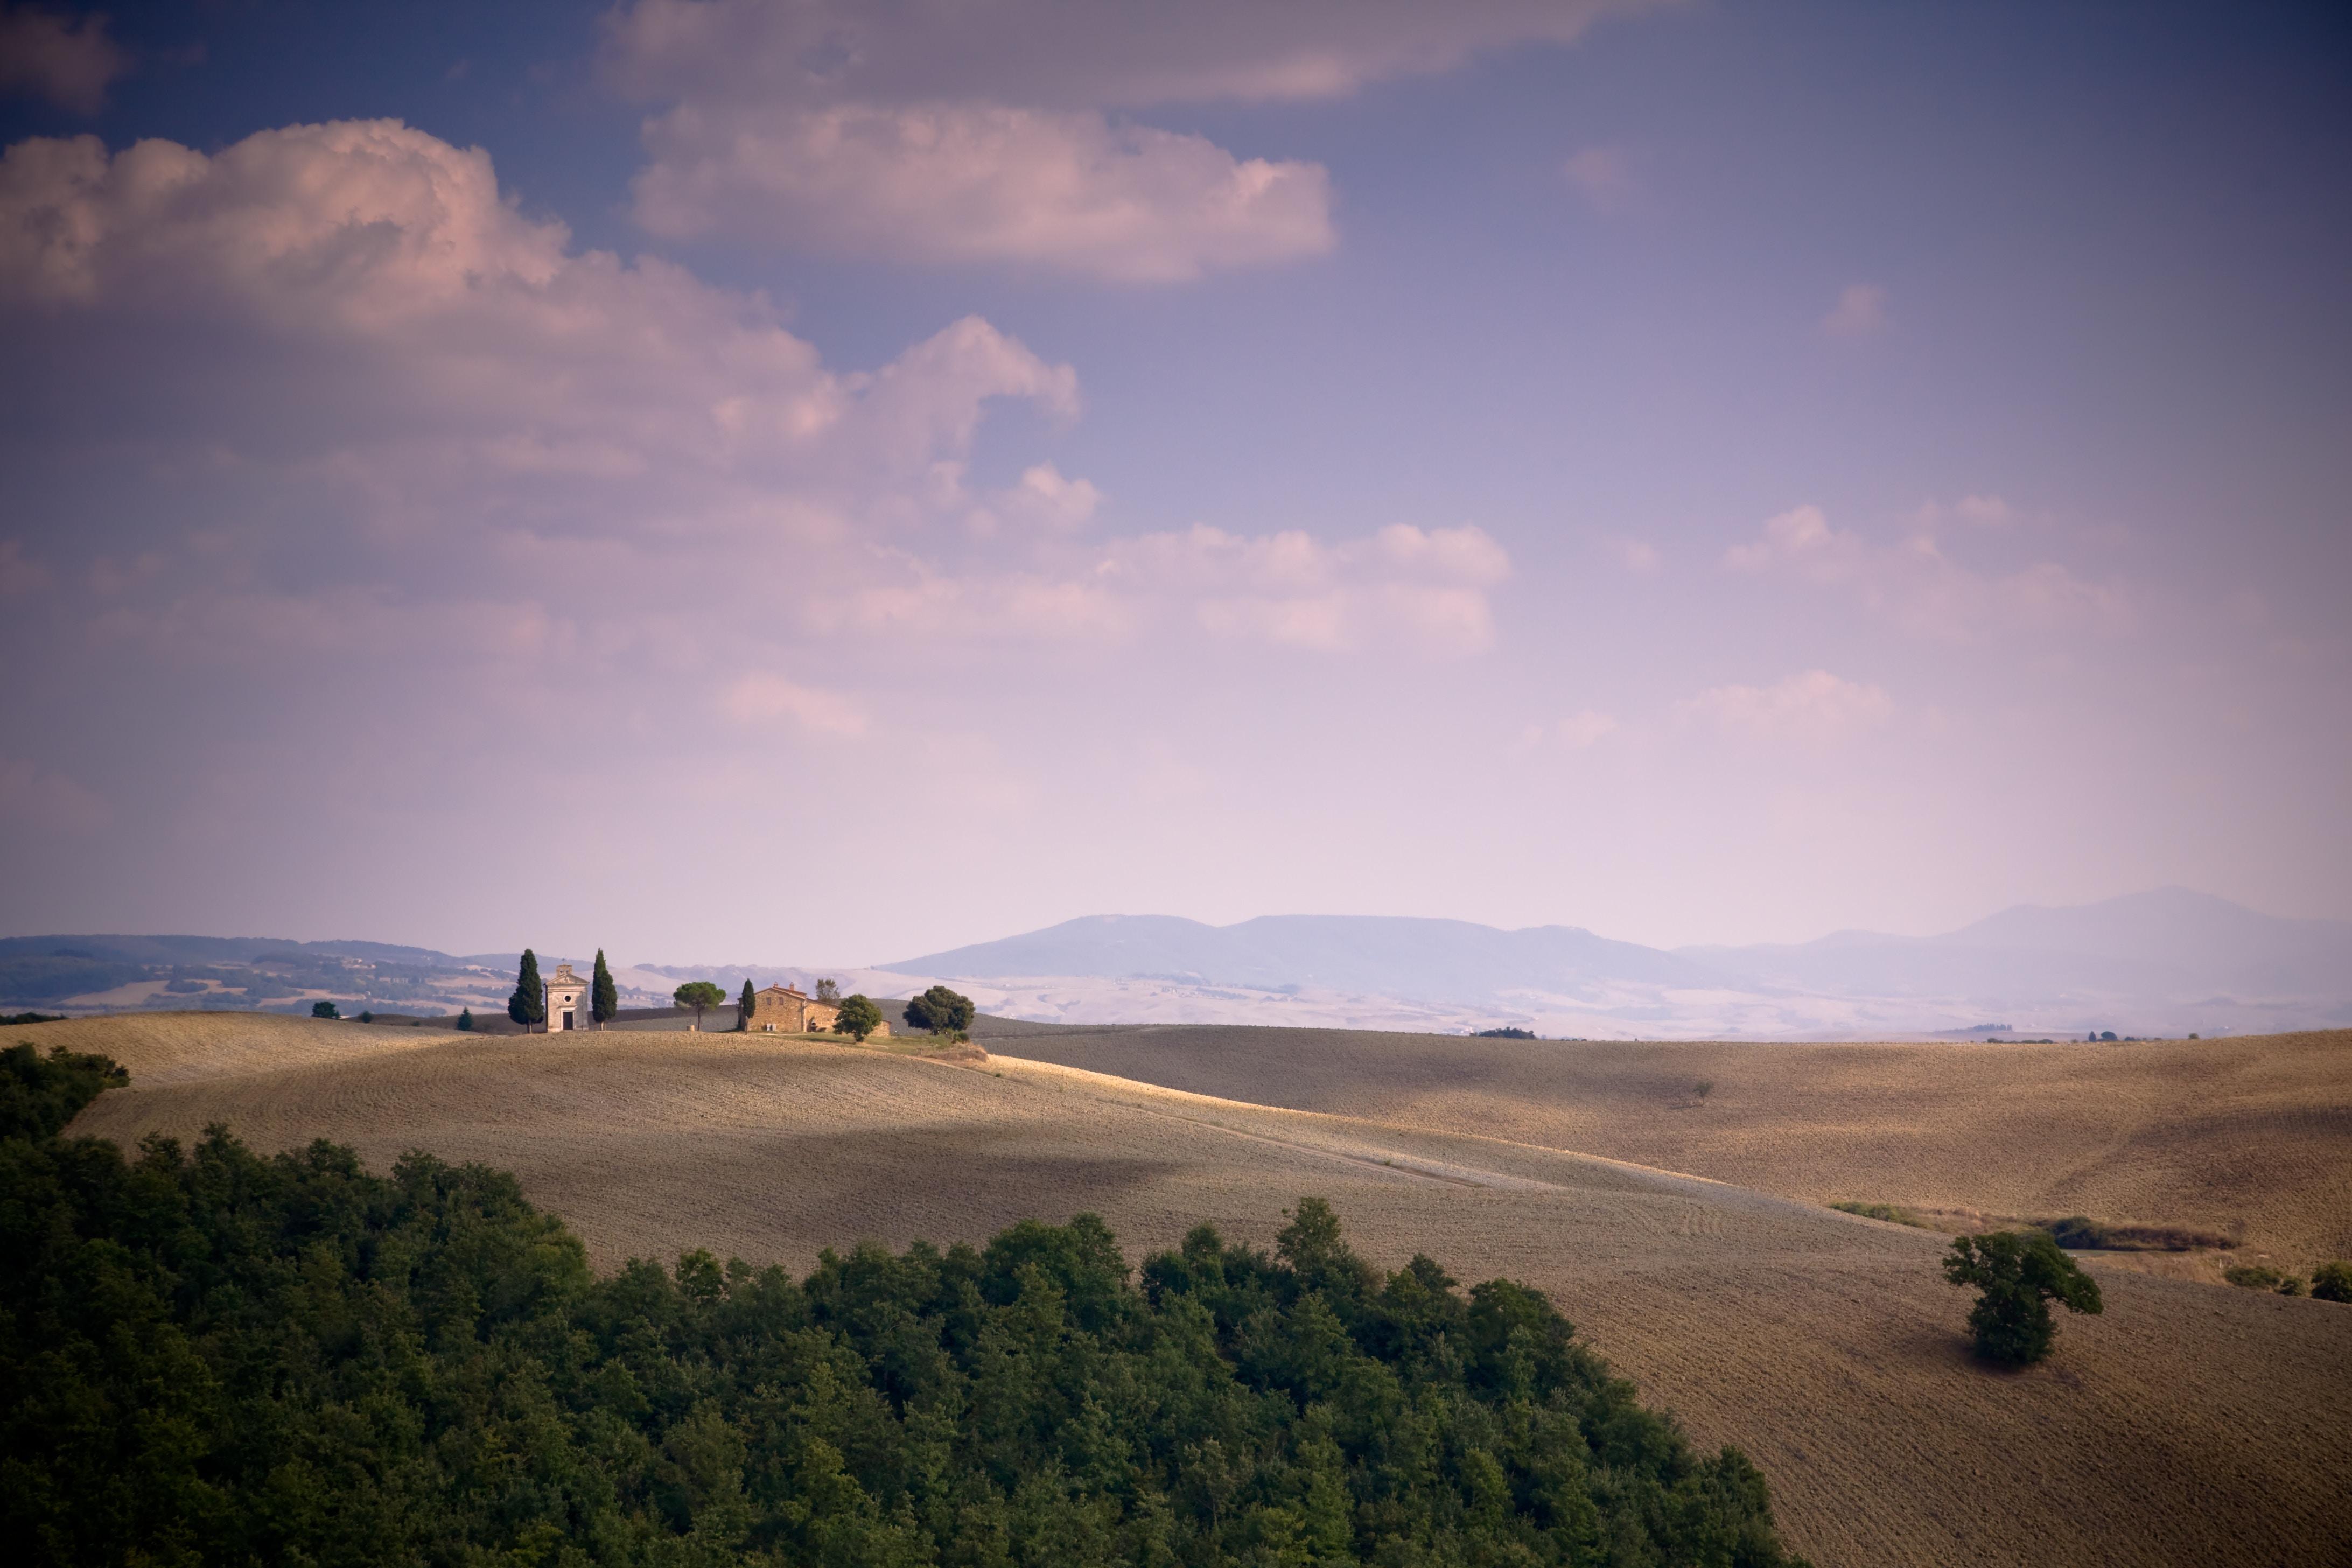 The sun setting over Tuscany